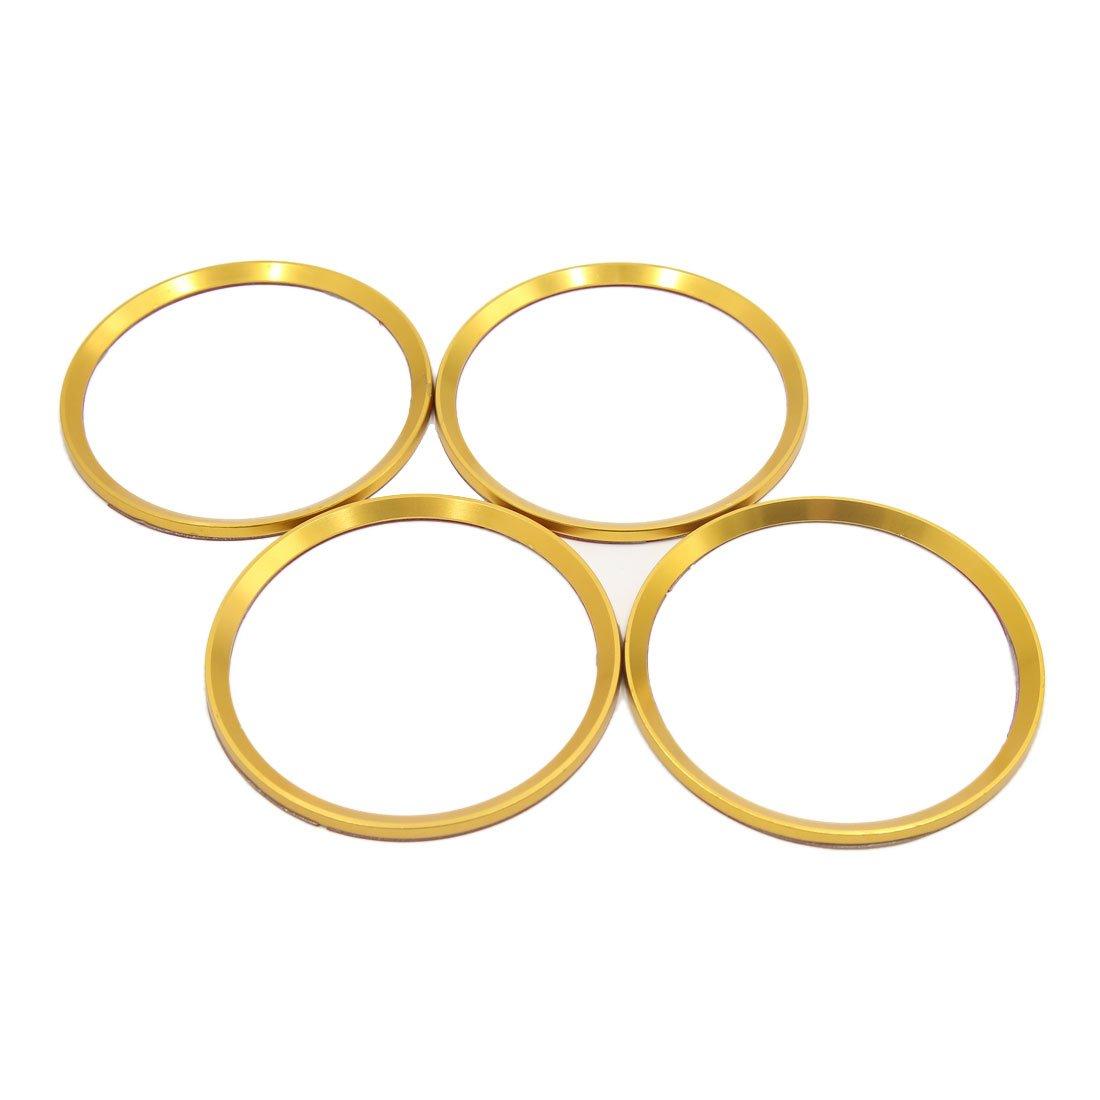 uxcell 4pcs Gold Tone Car Wheel Center Hub Emblem Decorative Trim Ring Circle for BMW